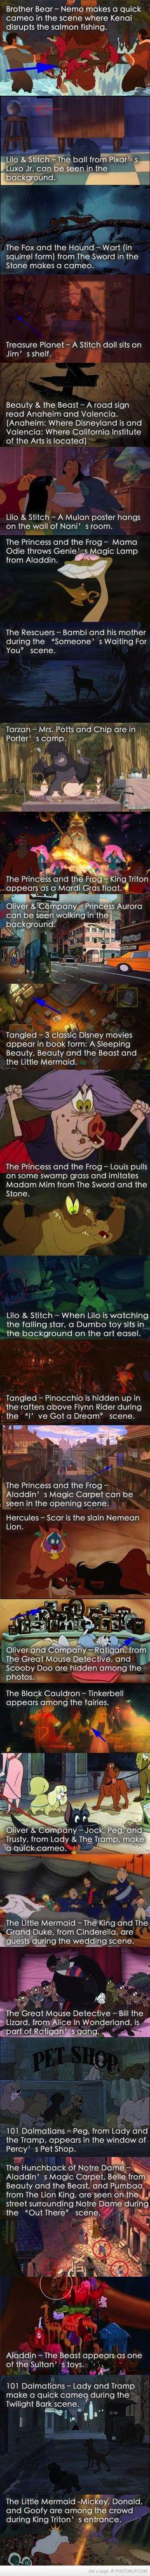 Disney Movies Hidden Gems